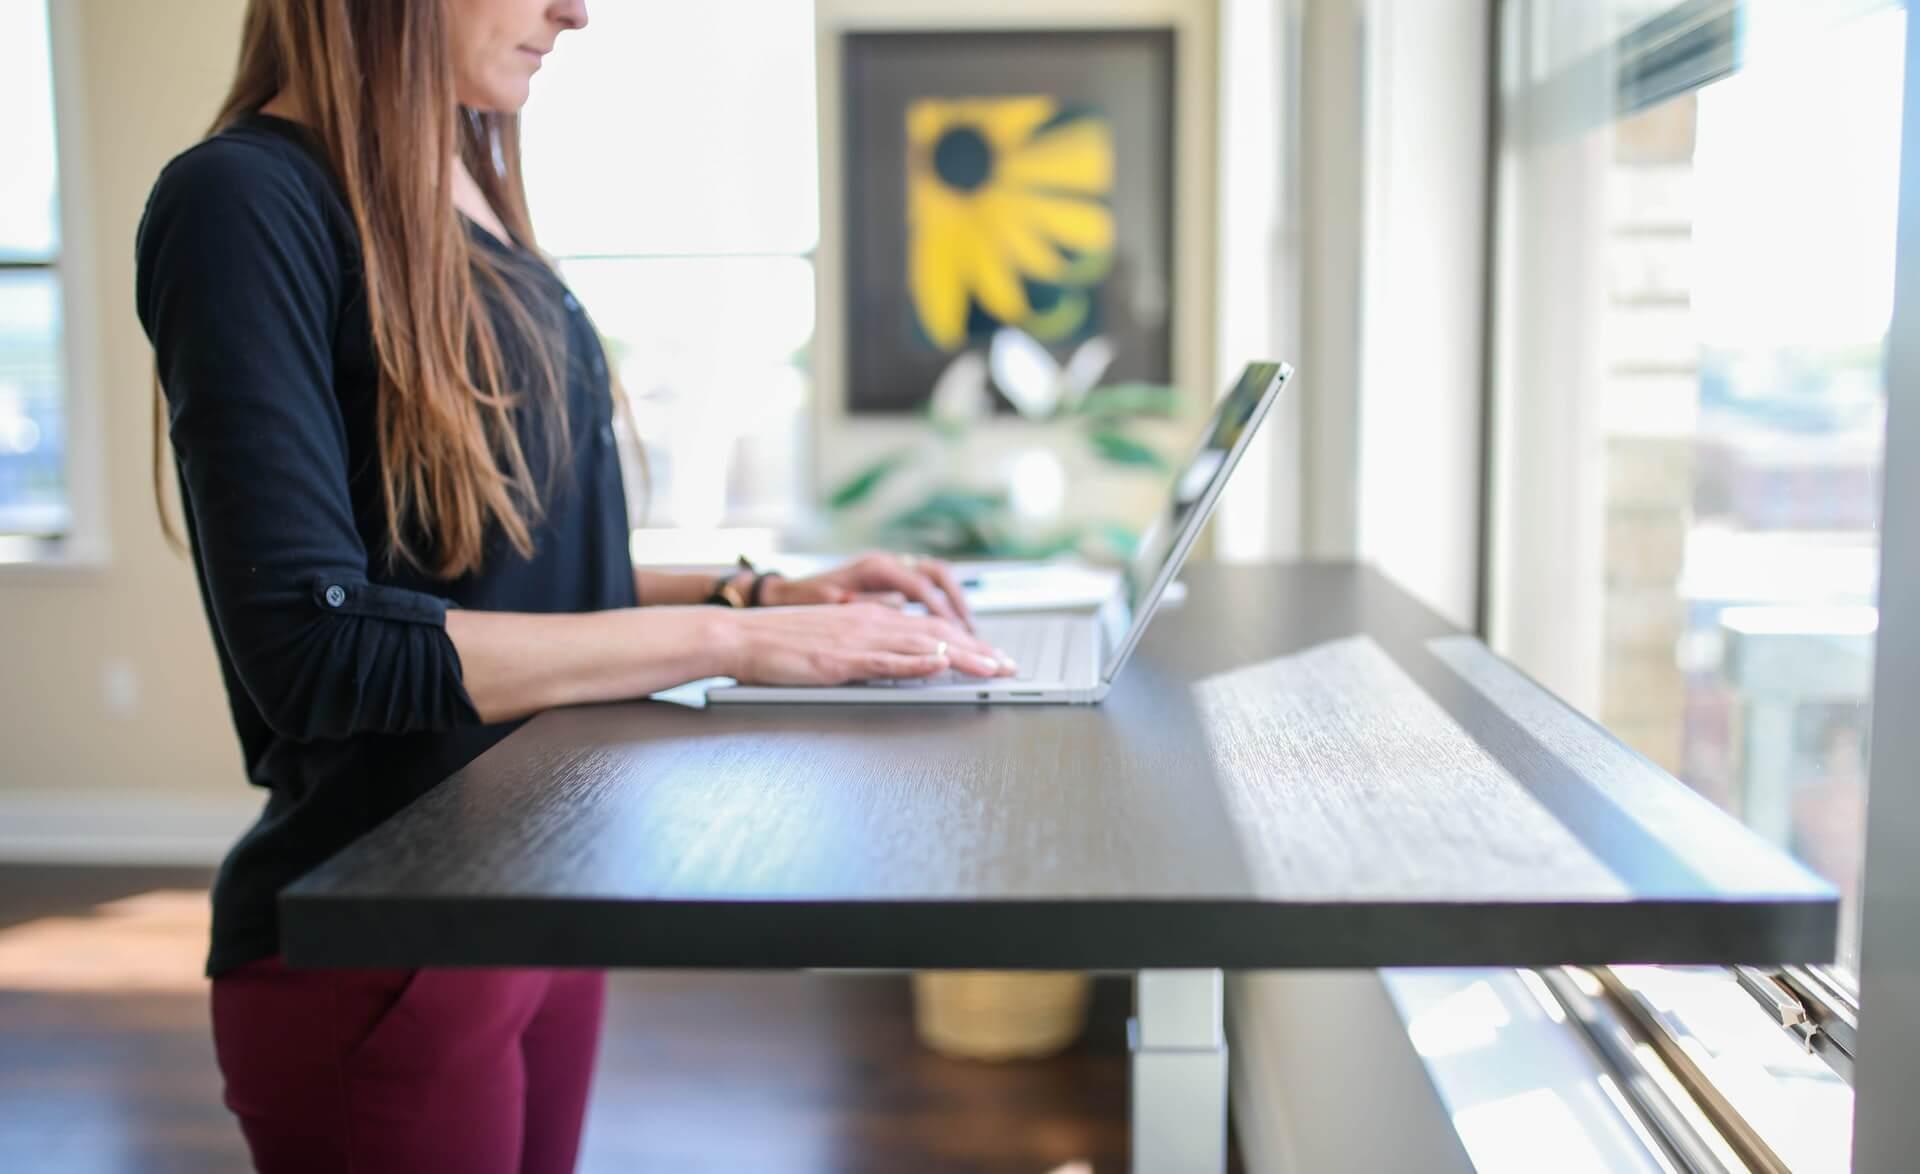 C:\Users\BISMILLAH NAWAITU\Downloads\Things to consider before buying a corner desk.jpg